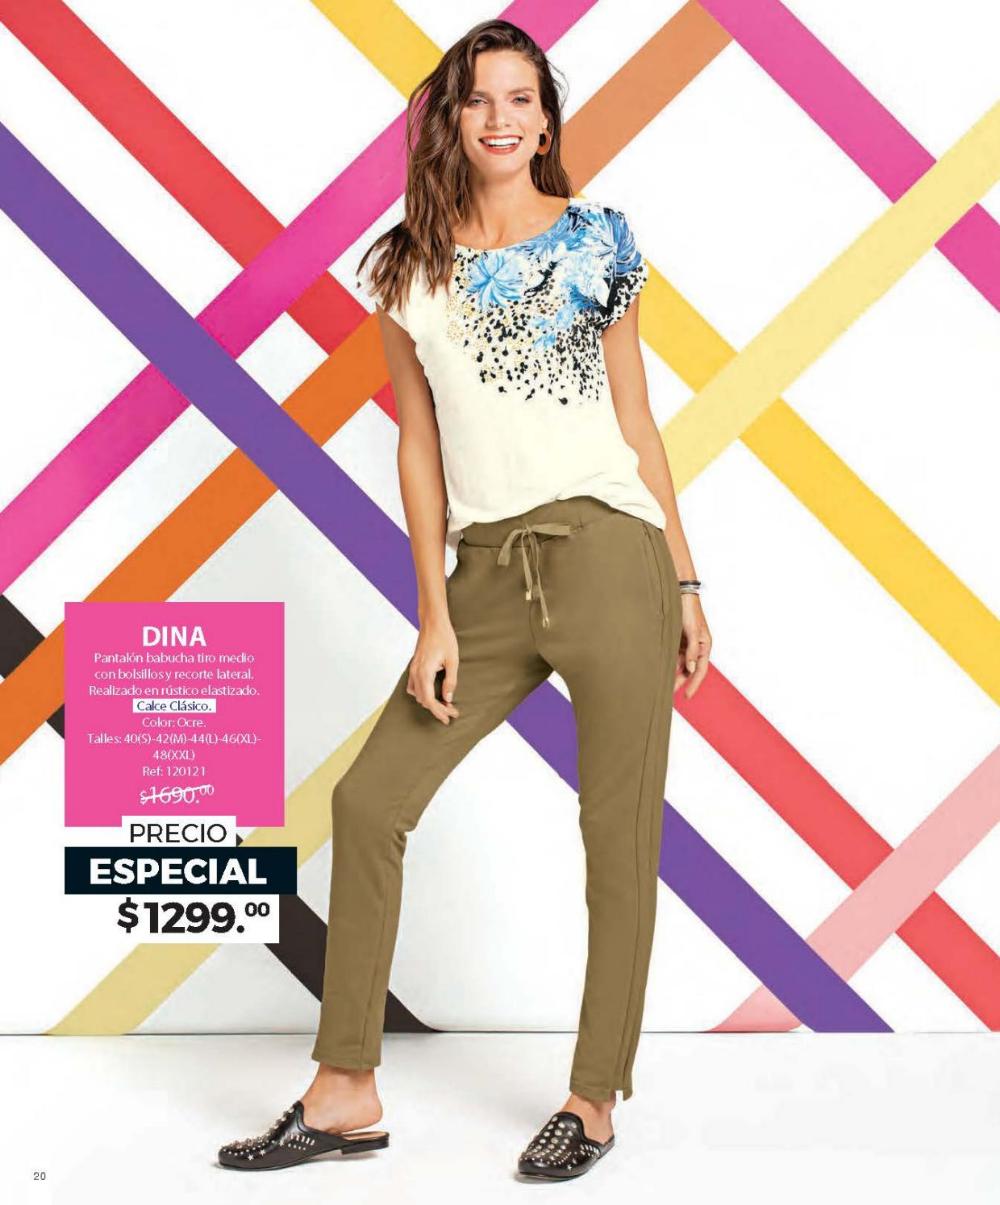 Pin En Moda Primavera Verano 2020 Argentina